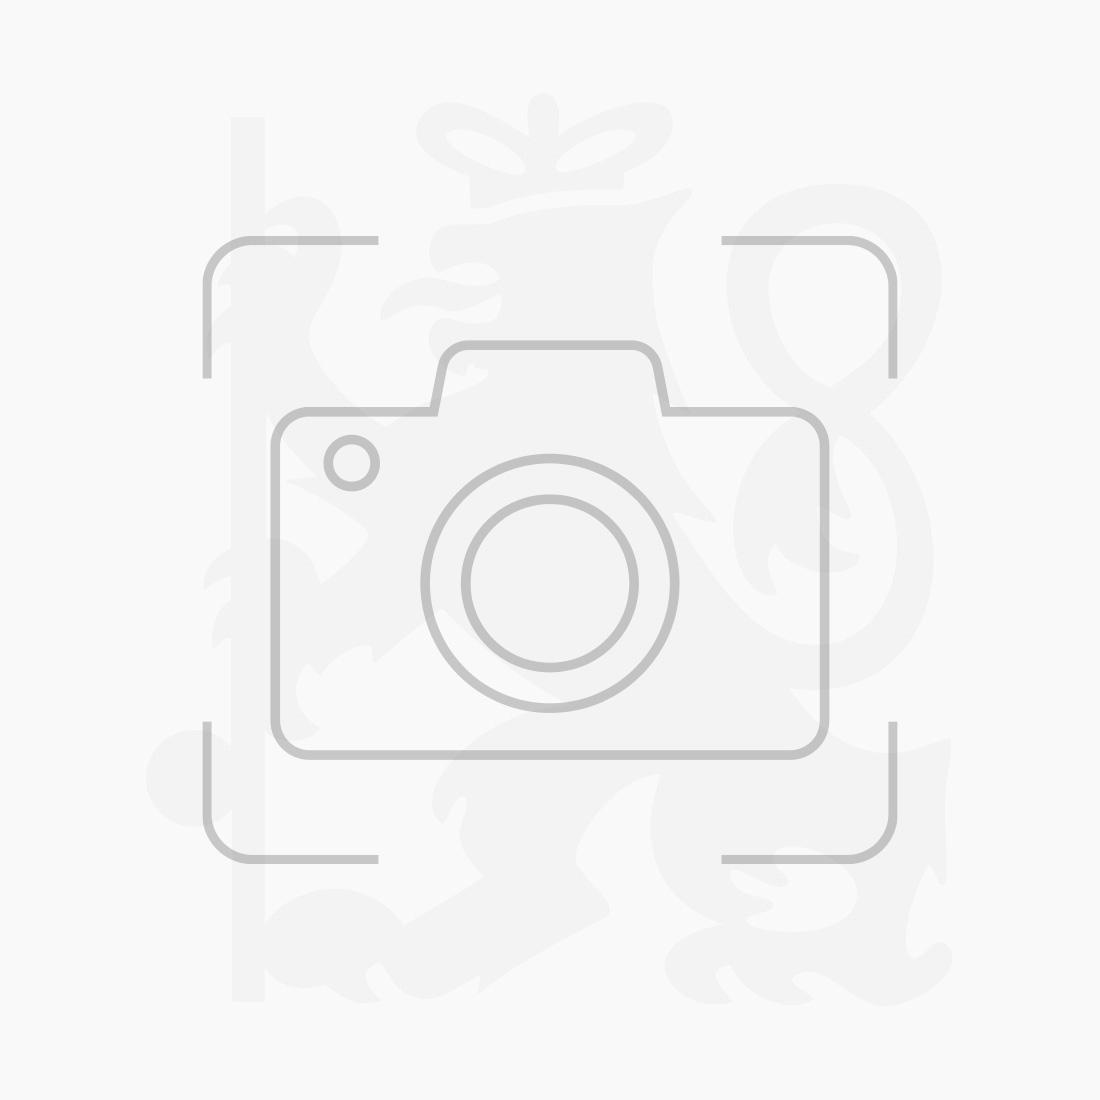 ARMA SKIN™ SCS+ (SUPER COMPACT SHELTER +)